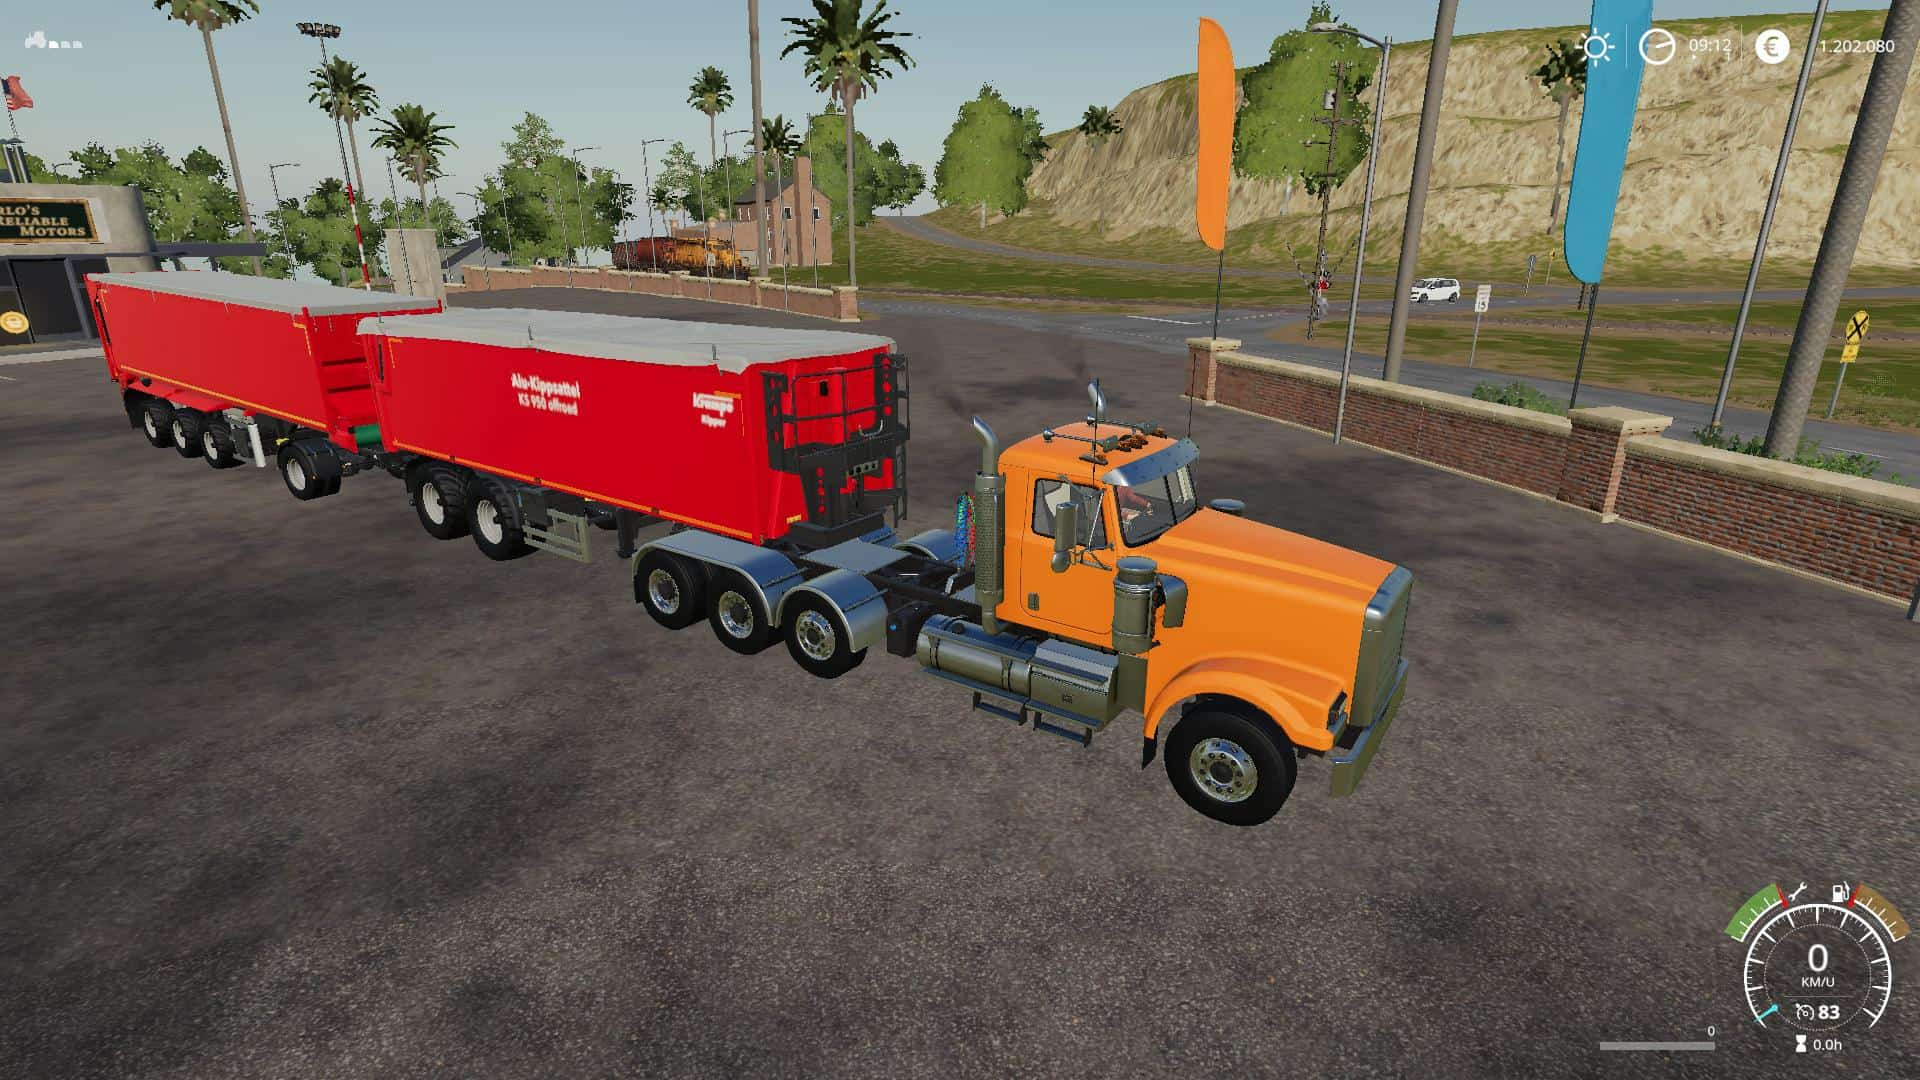 FS19 Lizard Trucks v1 0 0 3 - Farming simulator 2019 / 2017 / 2015 Mod